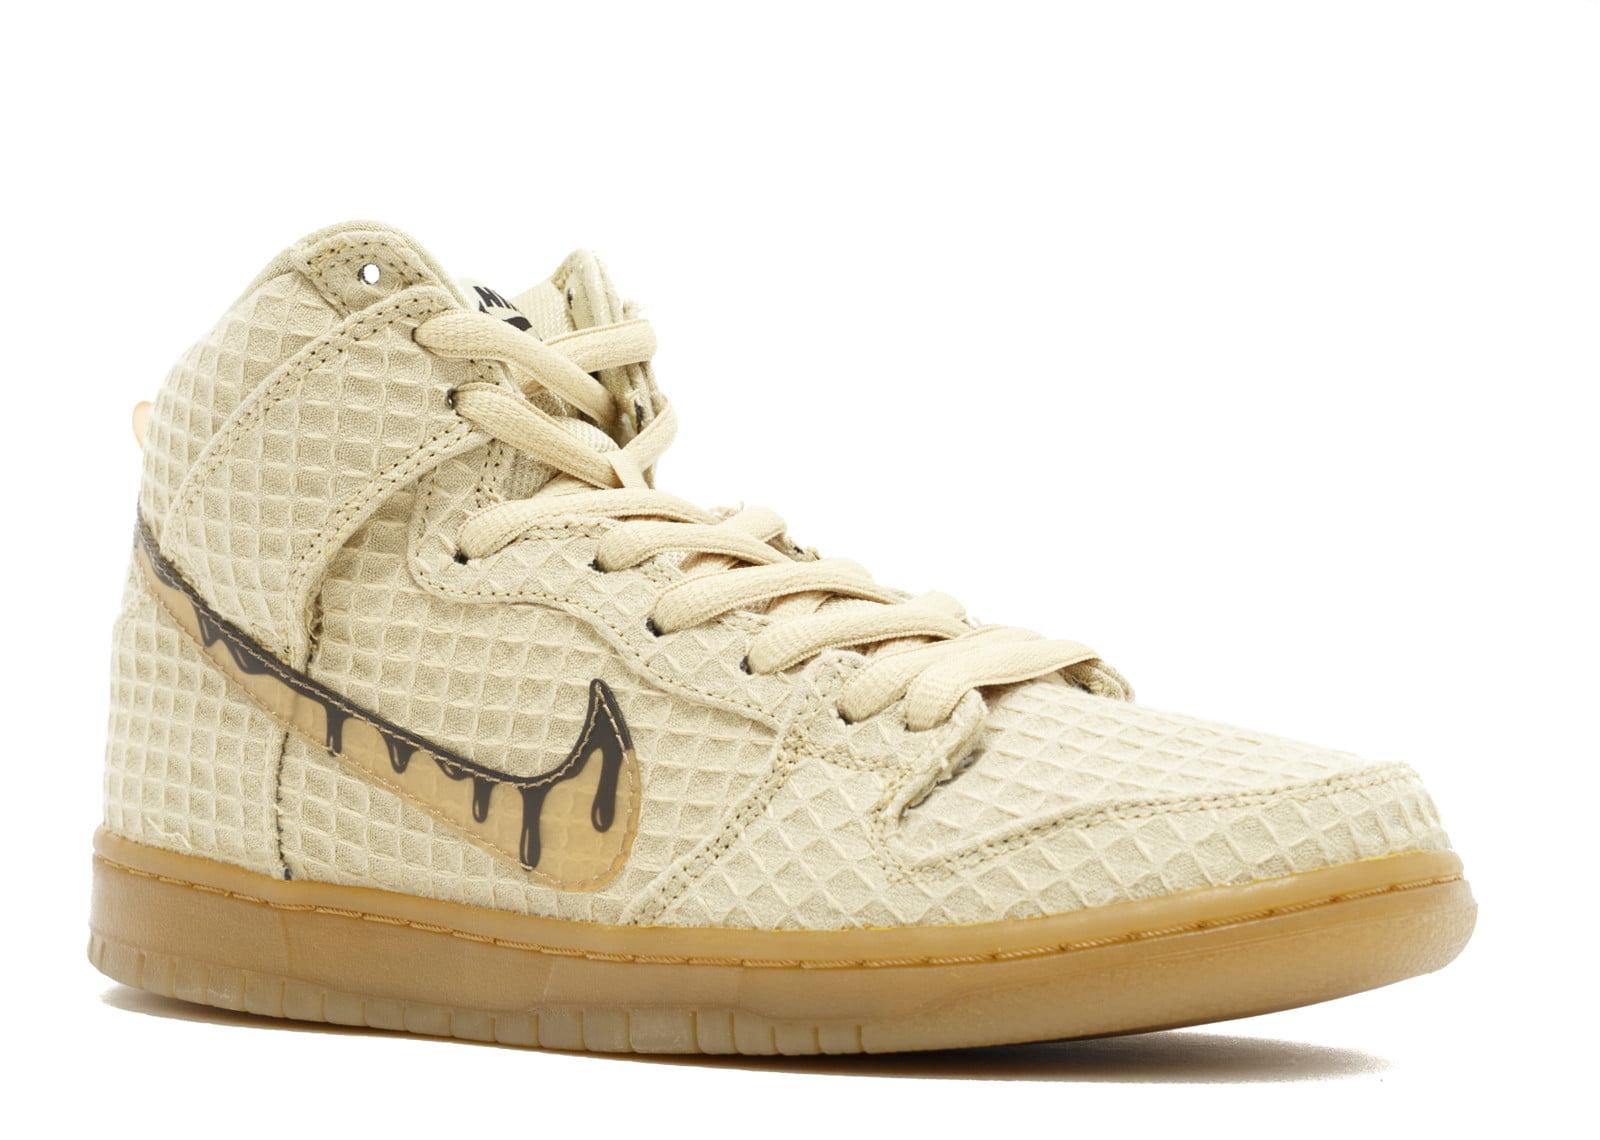 f8e5d448511d Nike - Men - Dunk High Premium Sb  Chicken And Waffles  - 313171-722 - Size  8.5